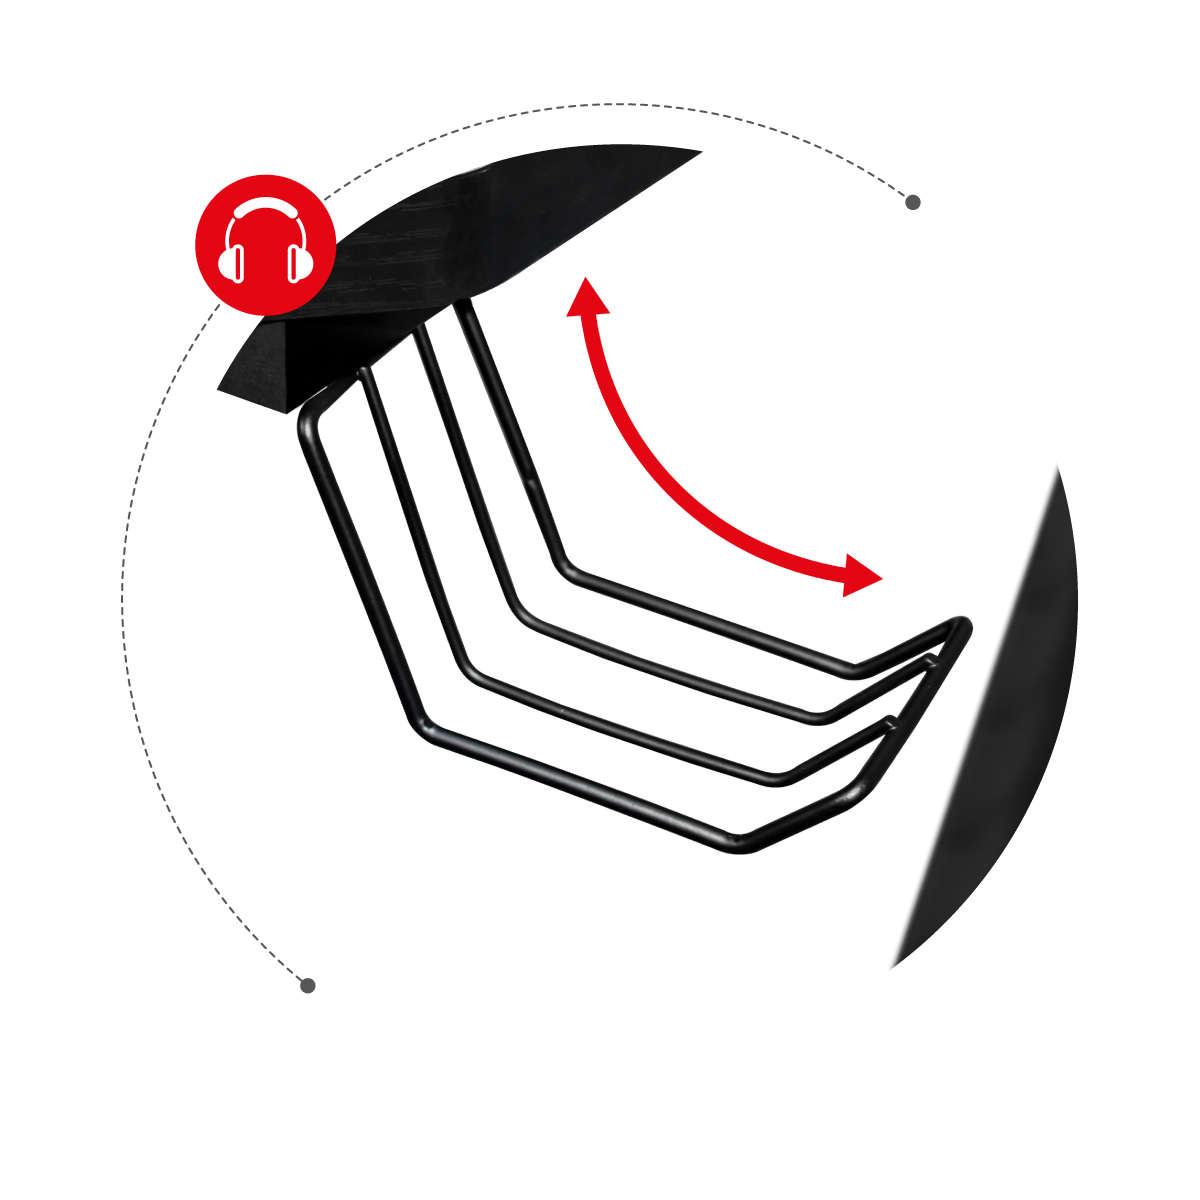 Huzaro Hero 7.0 uchwyt na słuchawki